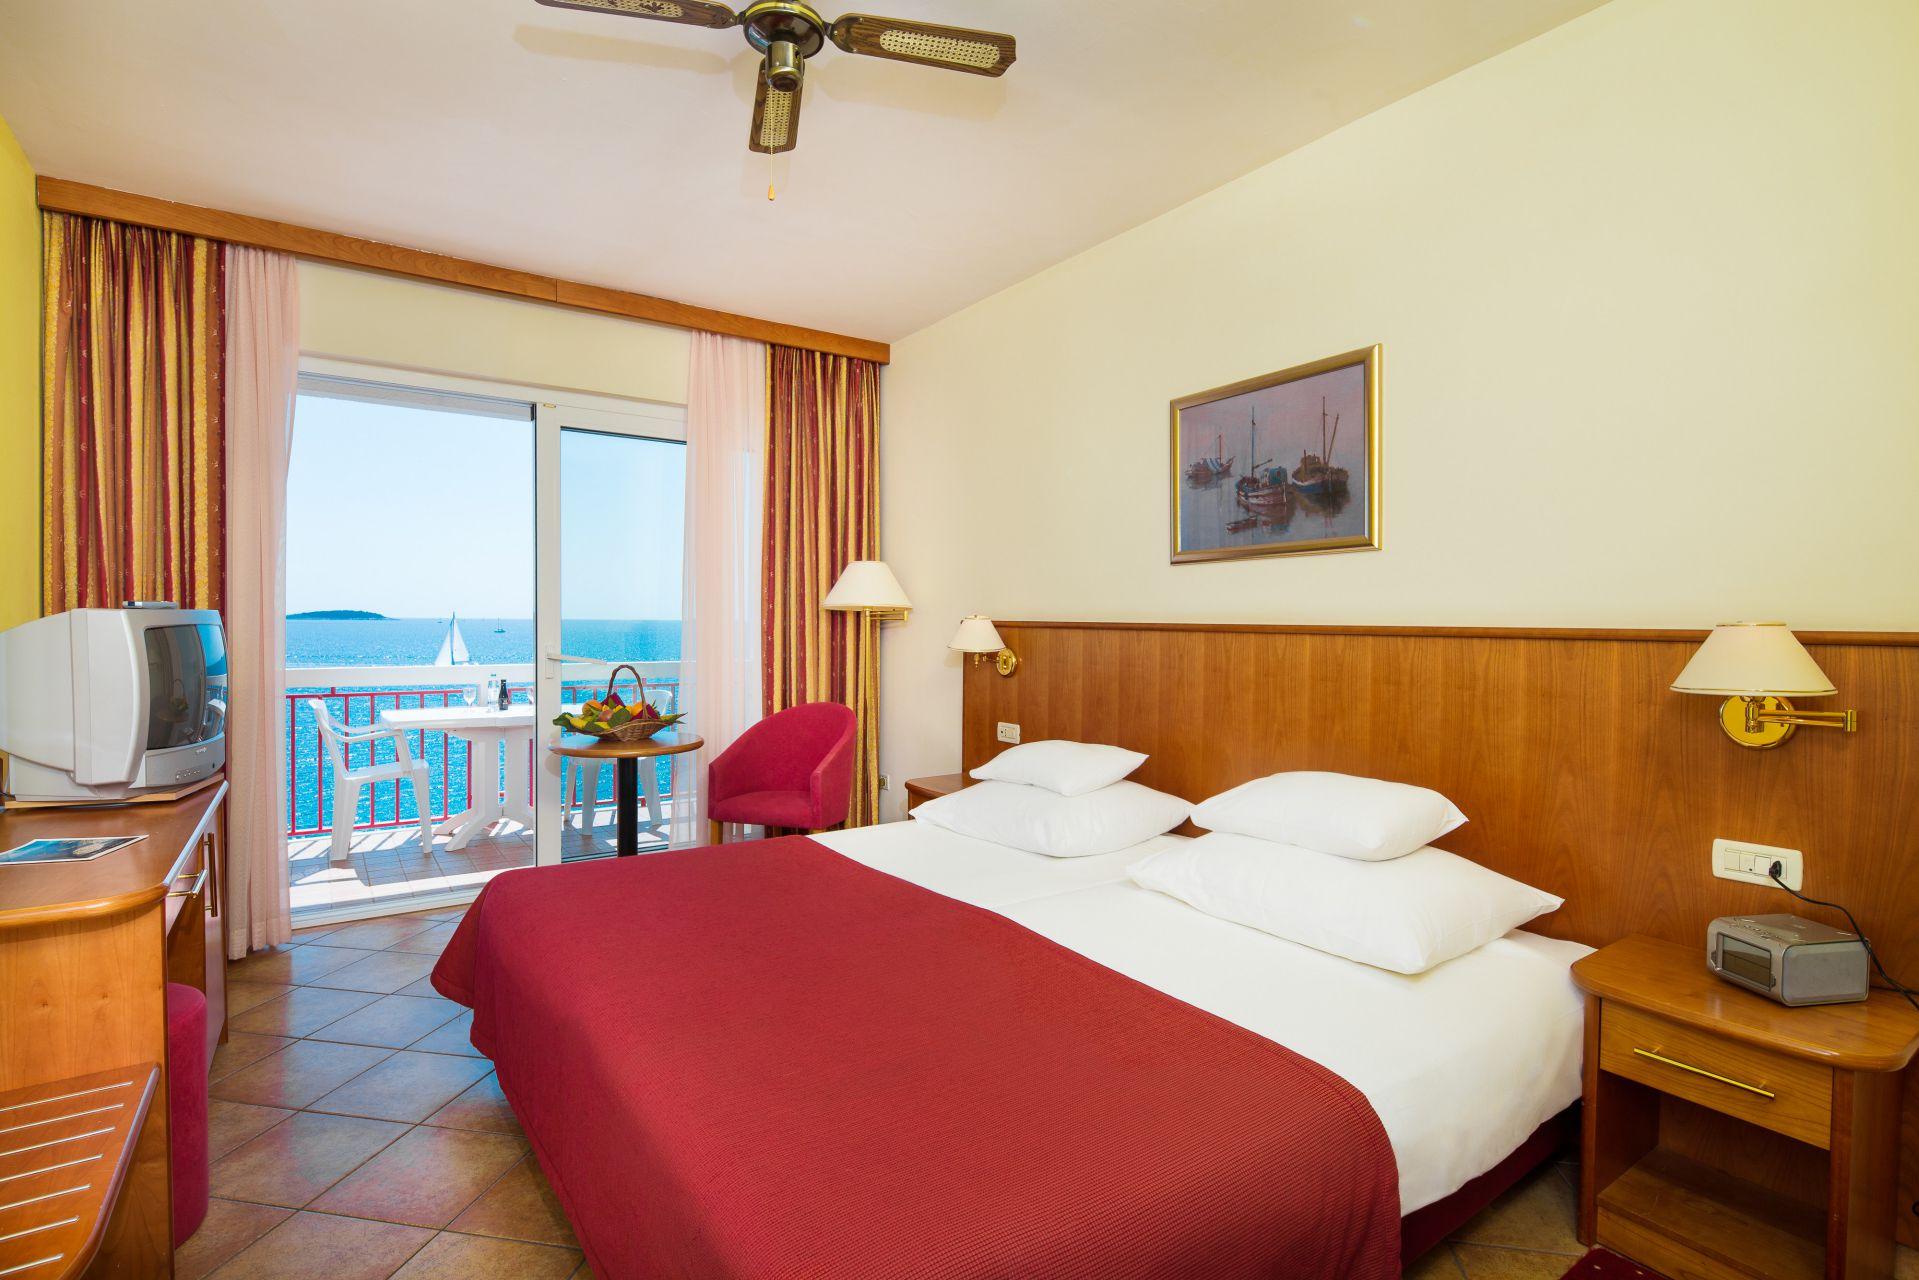 premier club room 02 14823095304 o - Zora Hotel